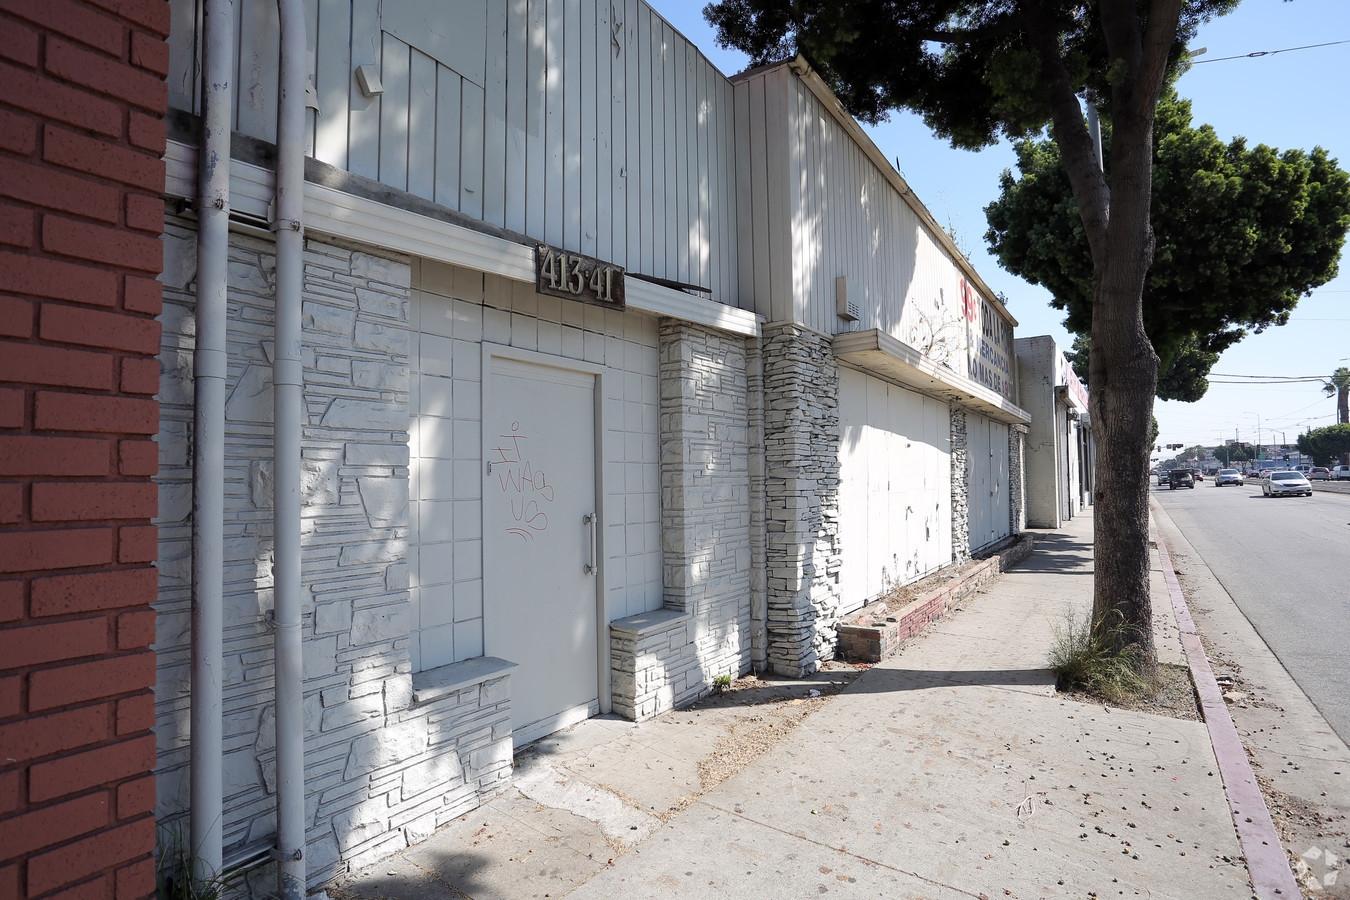 413-415 E Washington Blvd, Los Angeles, CA 90015 (3).jpg